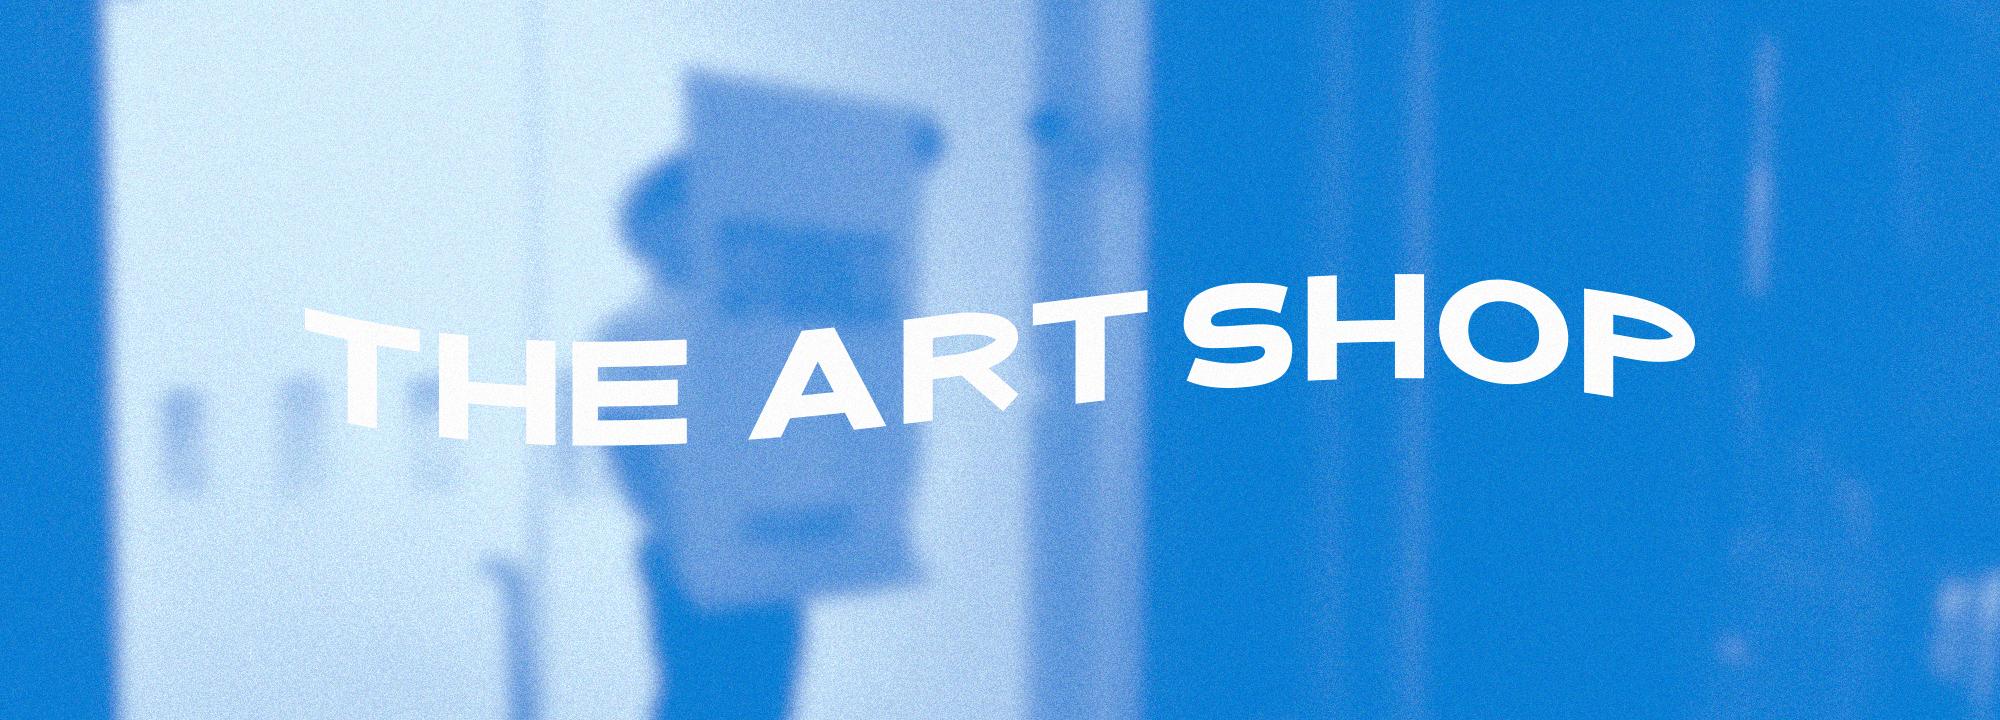 artshop-banner.jpg